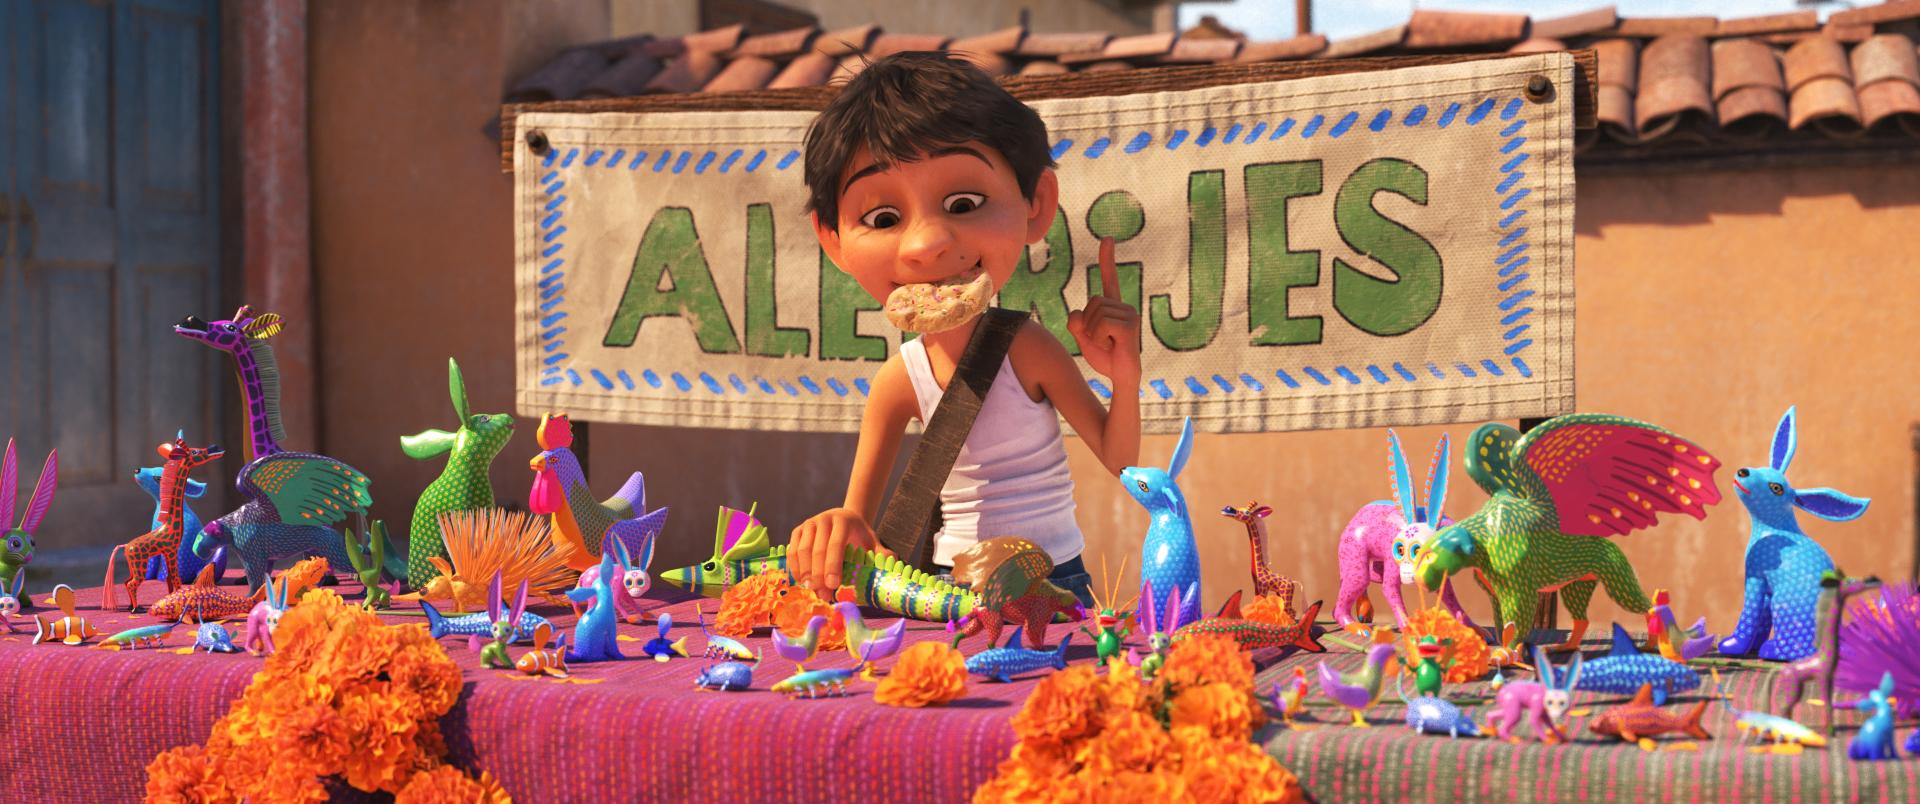 'Coco' to Screen at the Hollywood Bowl to Celebrate Día de Muertos